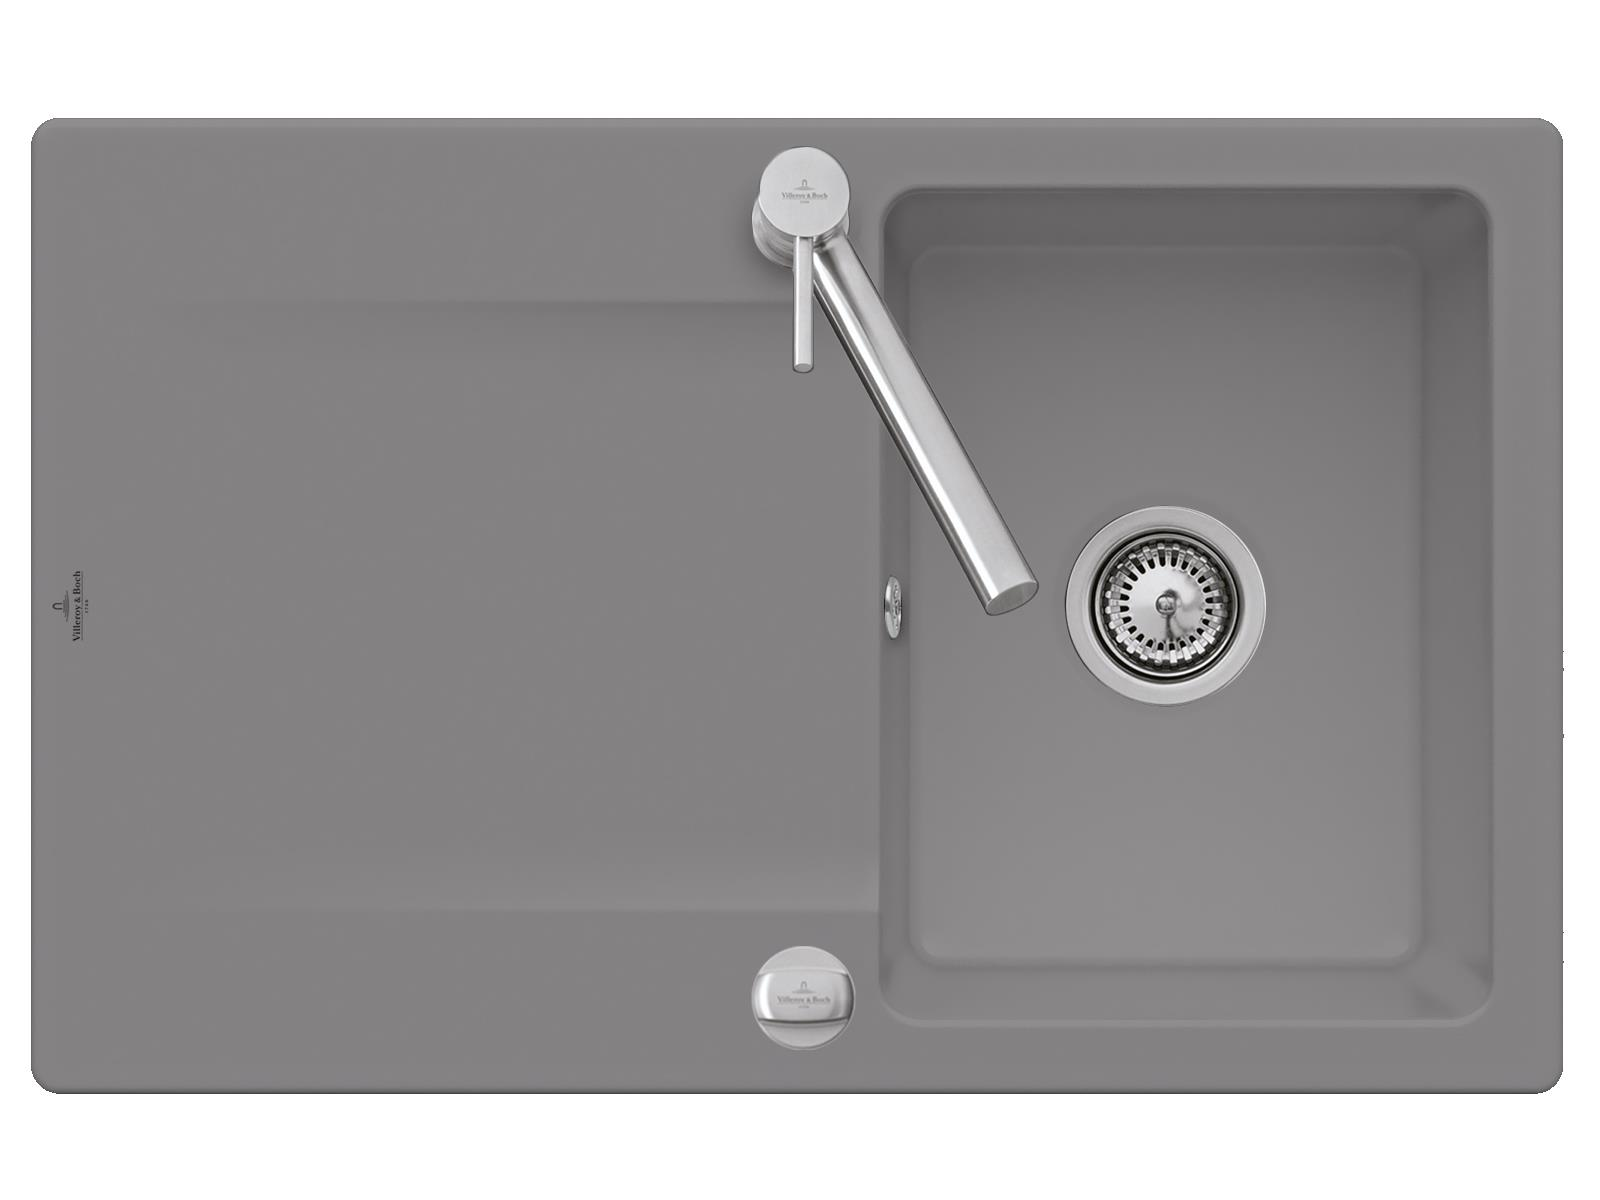 Villeroy & Boch Siluet 45 - 3334 02 SL Stone Keramikspüle Excenterbetätigung